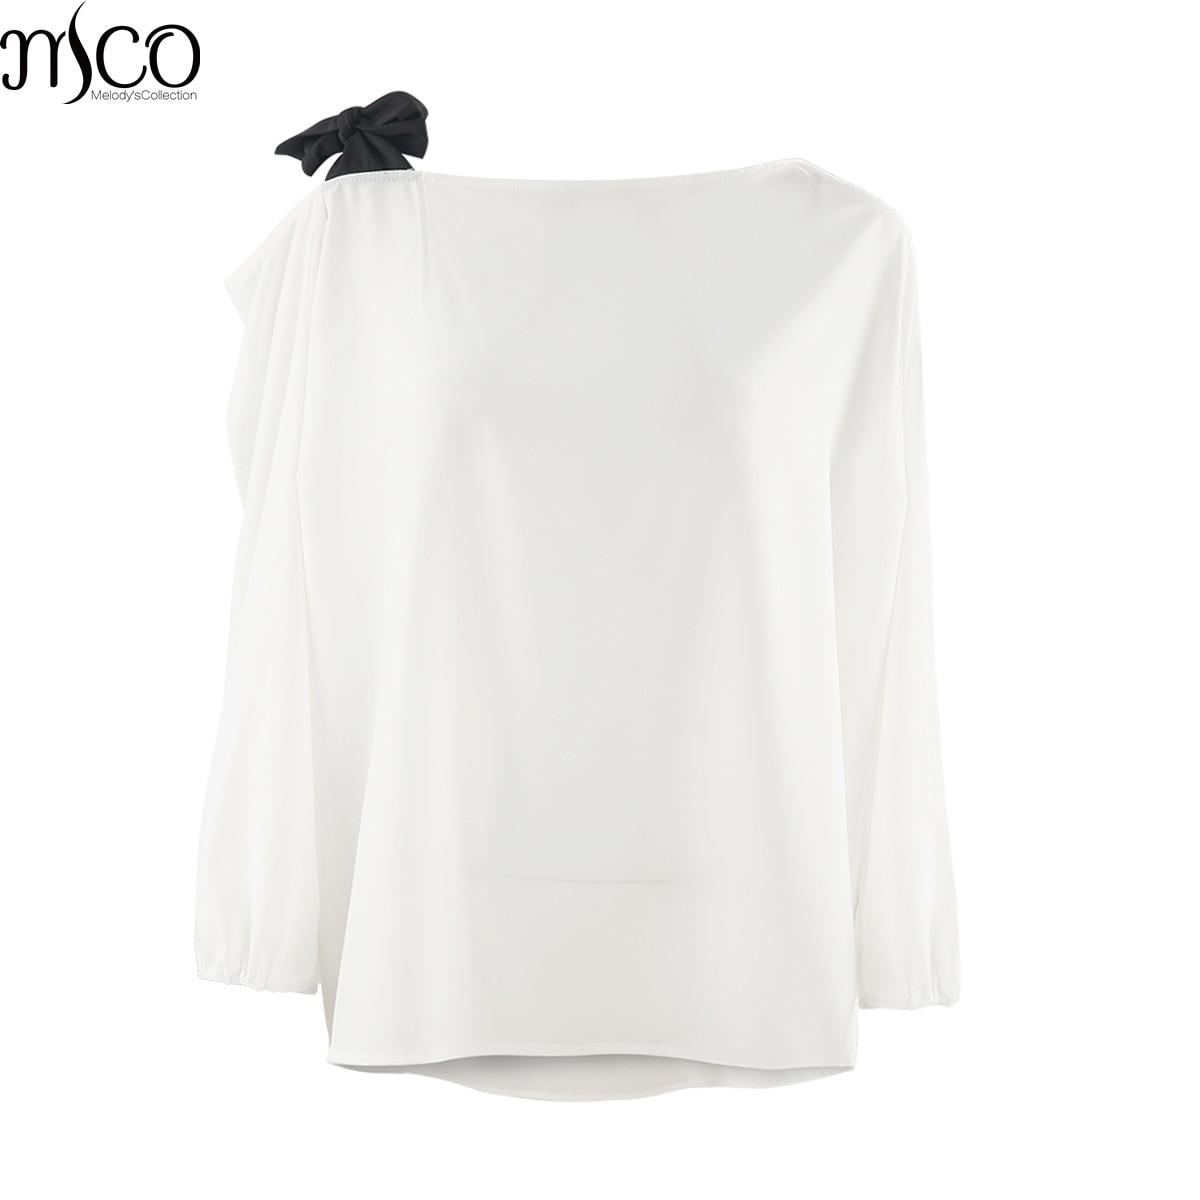 MCO 2018 Spring Sexy Tie One Shoulder Plus Size Women Top Fashion Office Ladies Oversized Blouse Basic OL White Tops 5xl 6xl 7xl